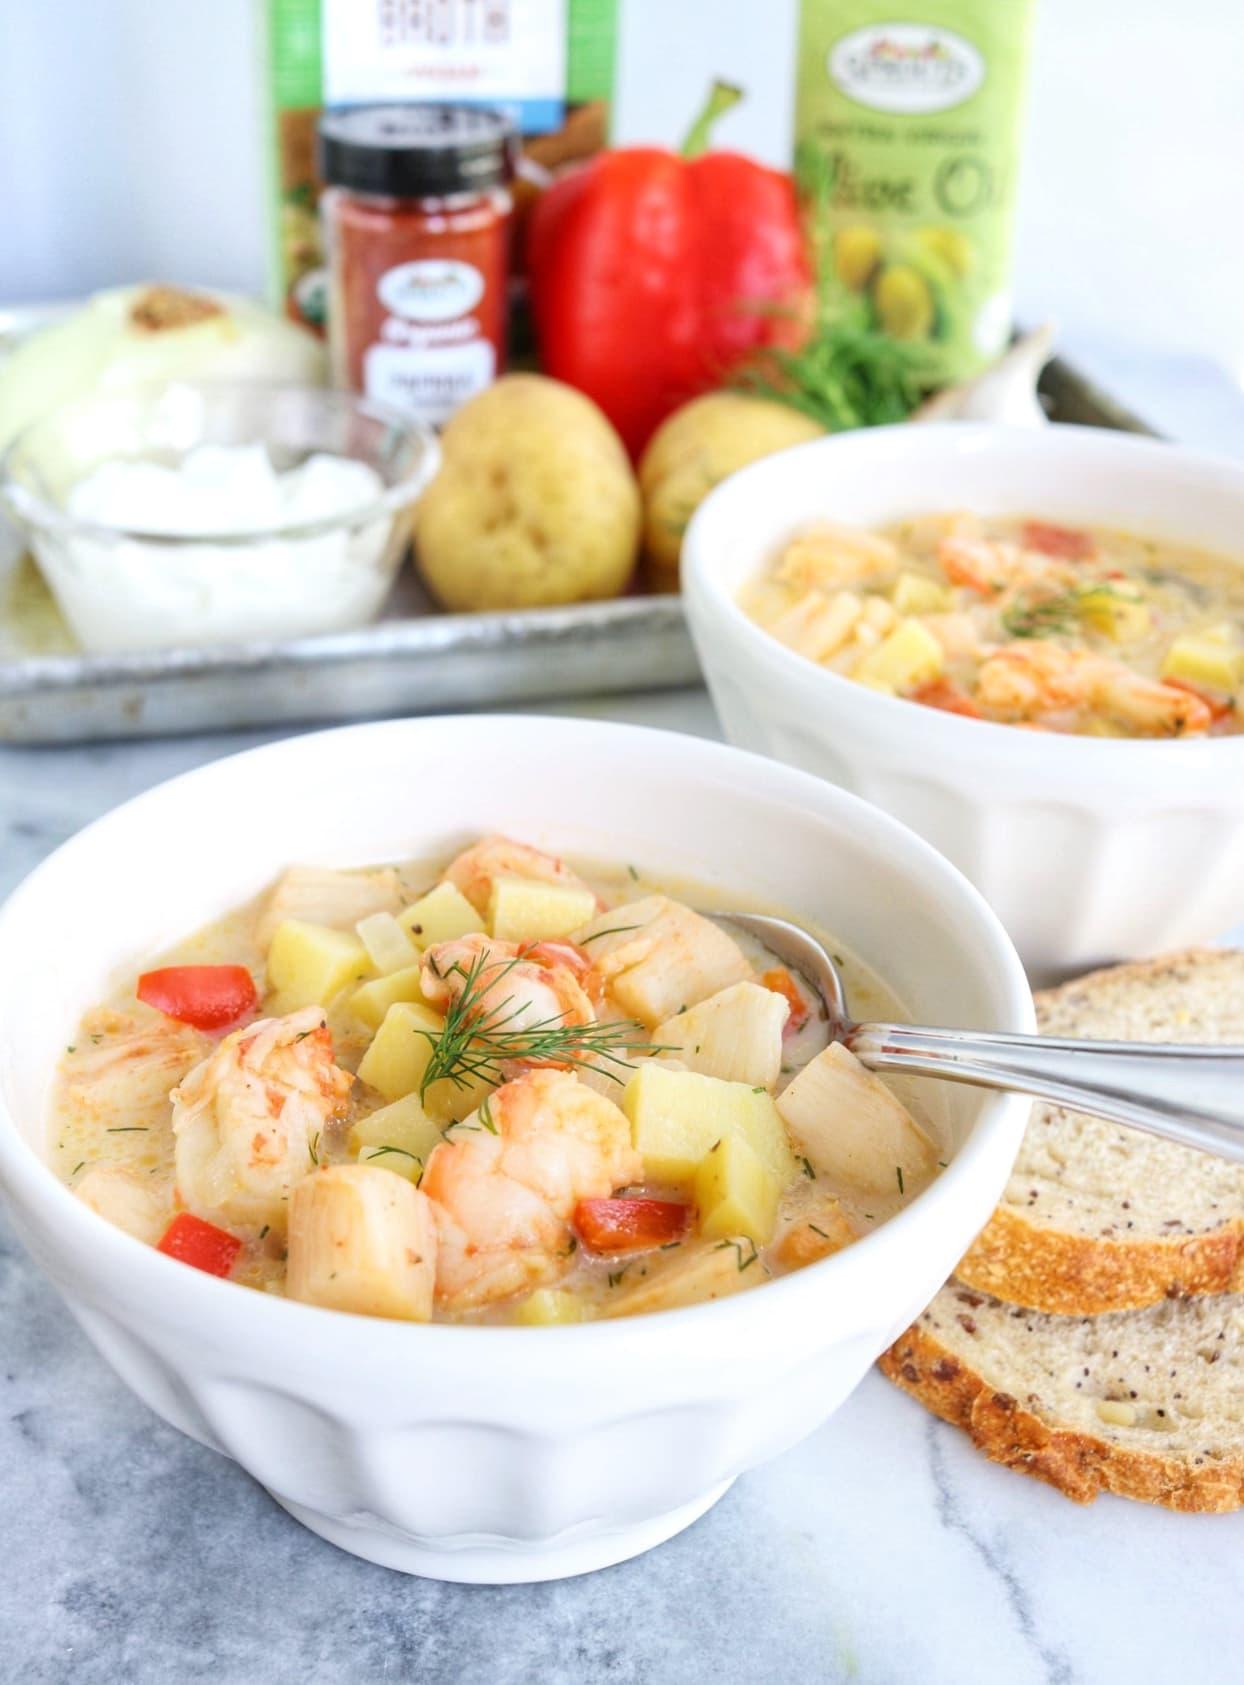 Scallop Itu Apa : scallop, Scallop, Shrimp, Nutrition, Adventure